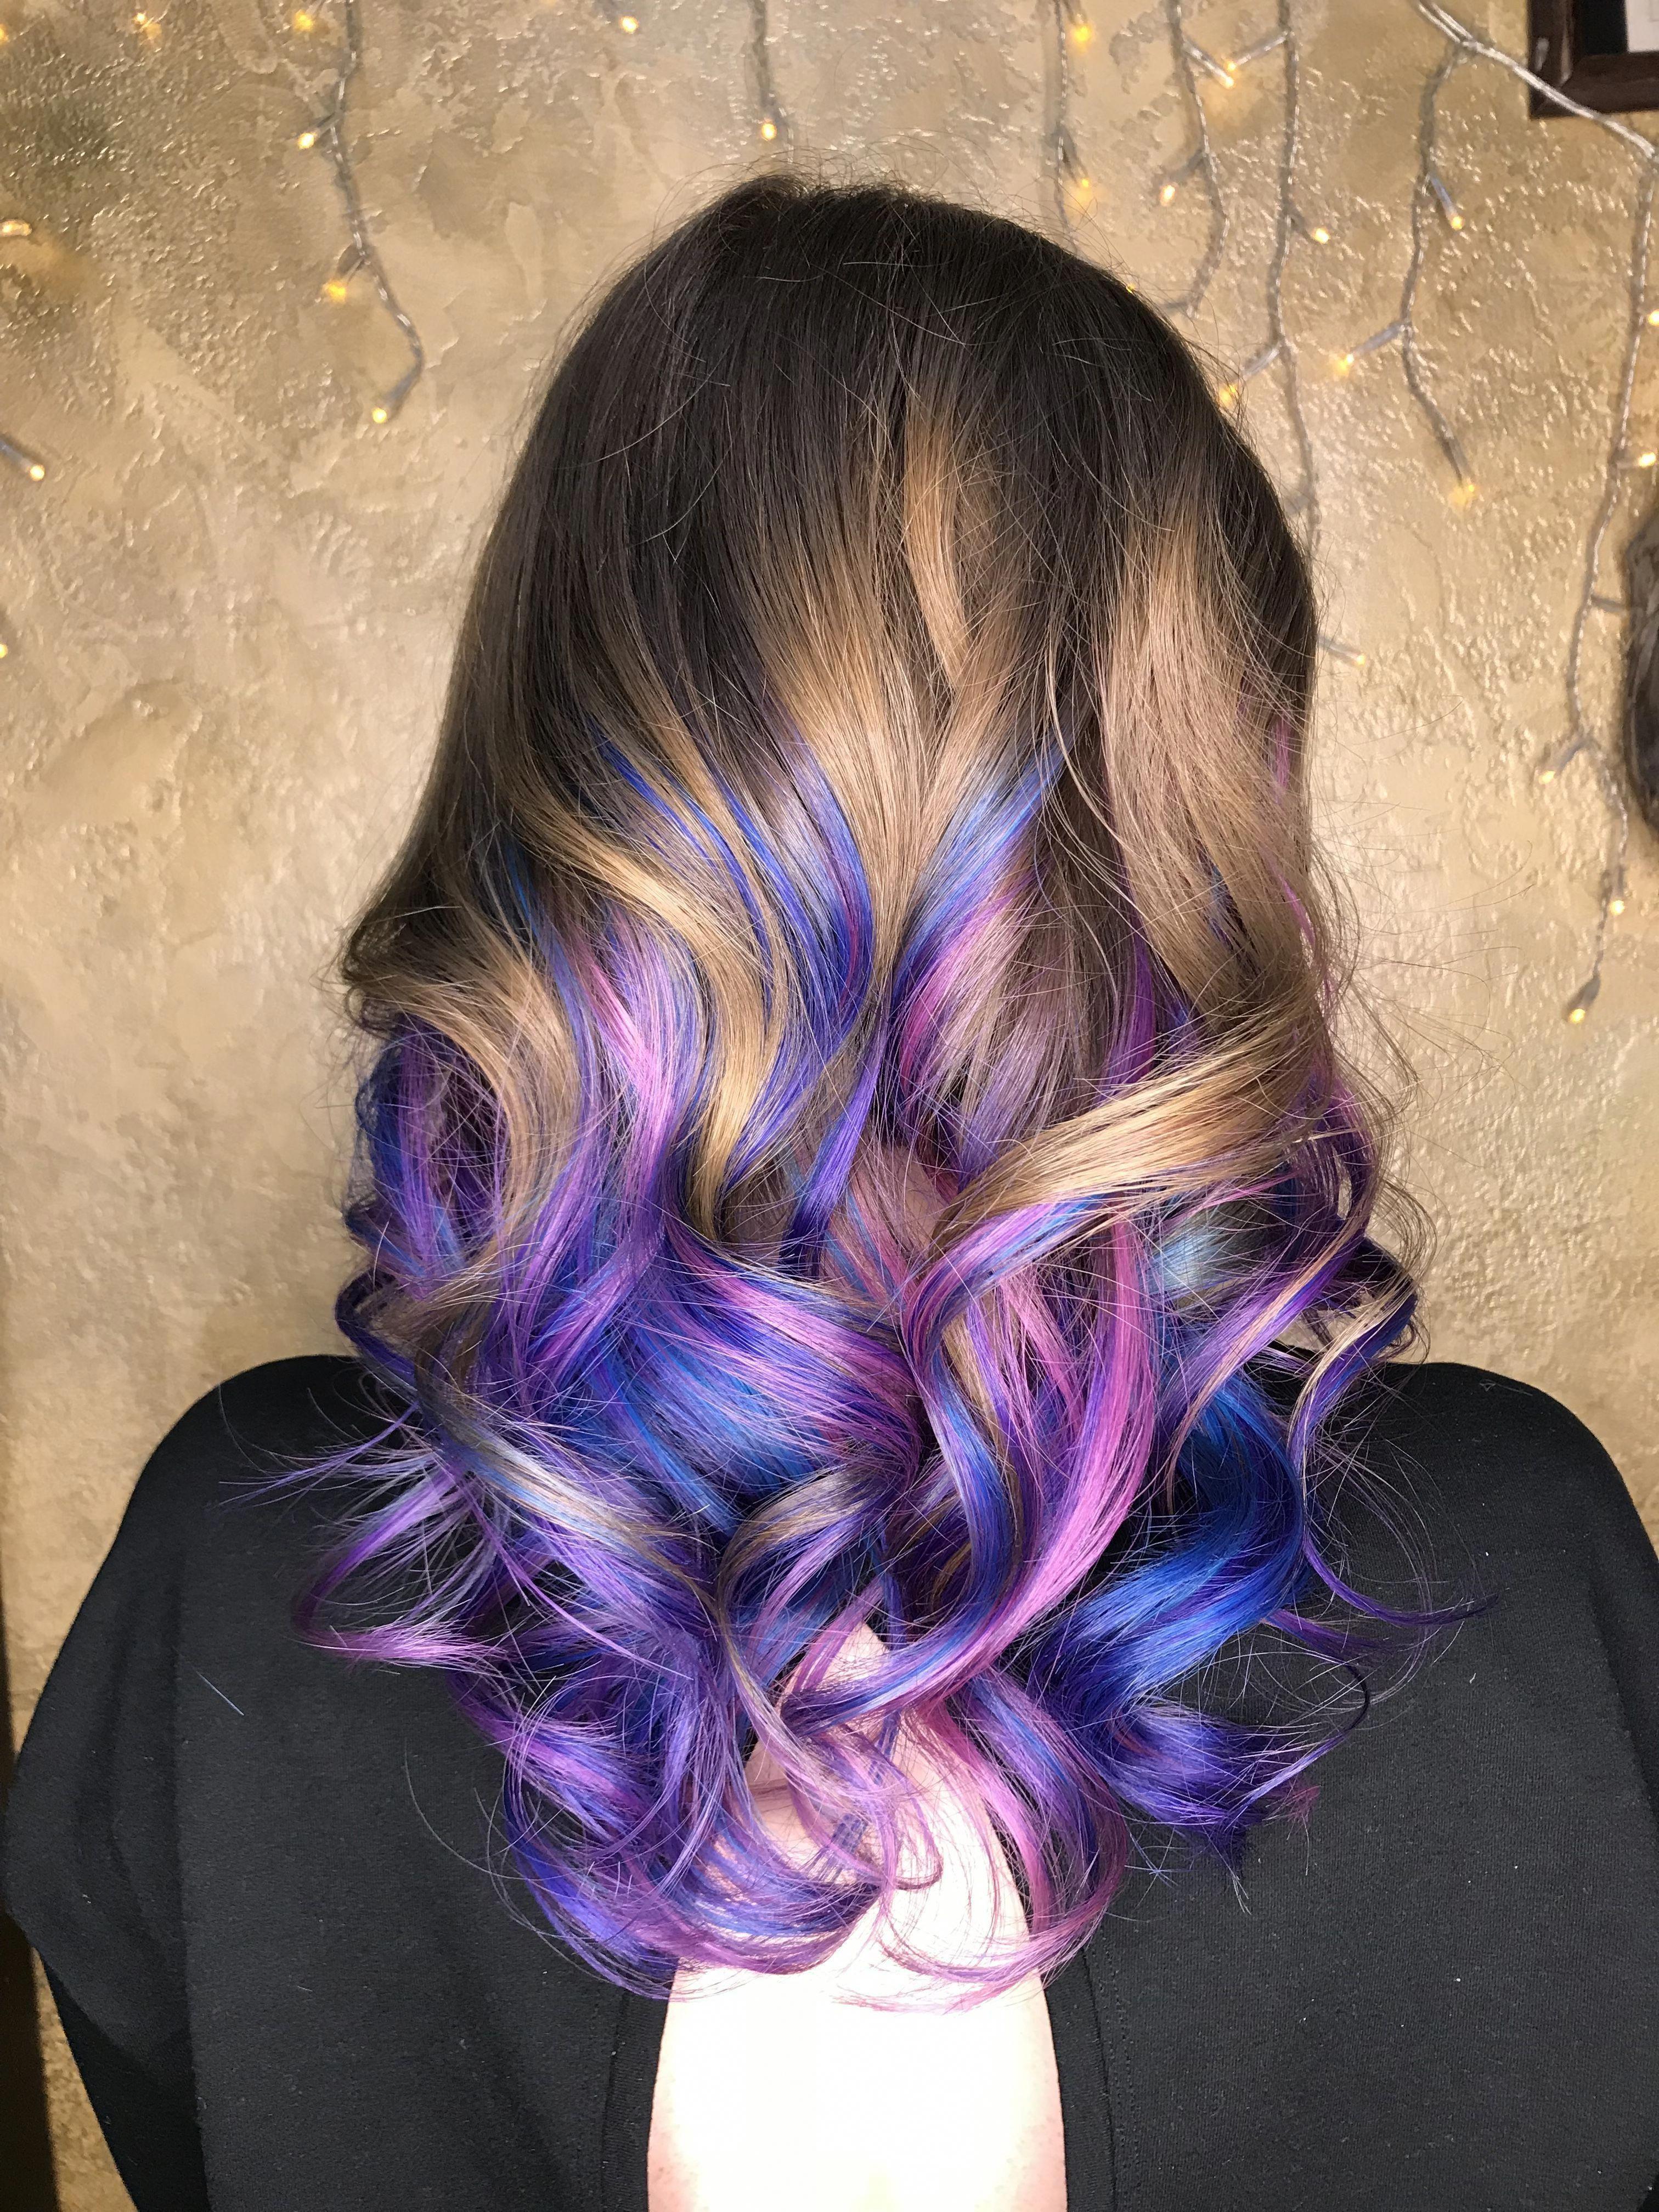 Hairstyles Blue Violet Ombre Hair Delectable Purple Hair Color Pastel Purple Hair Ideas Hairstylecool In 2020 Purple Ombre Hair Vivid Hair Color Hair Color Purple